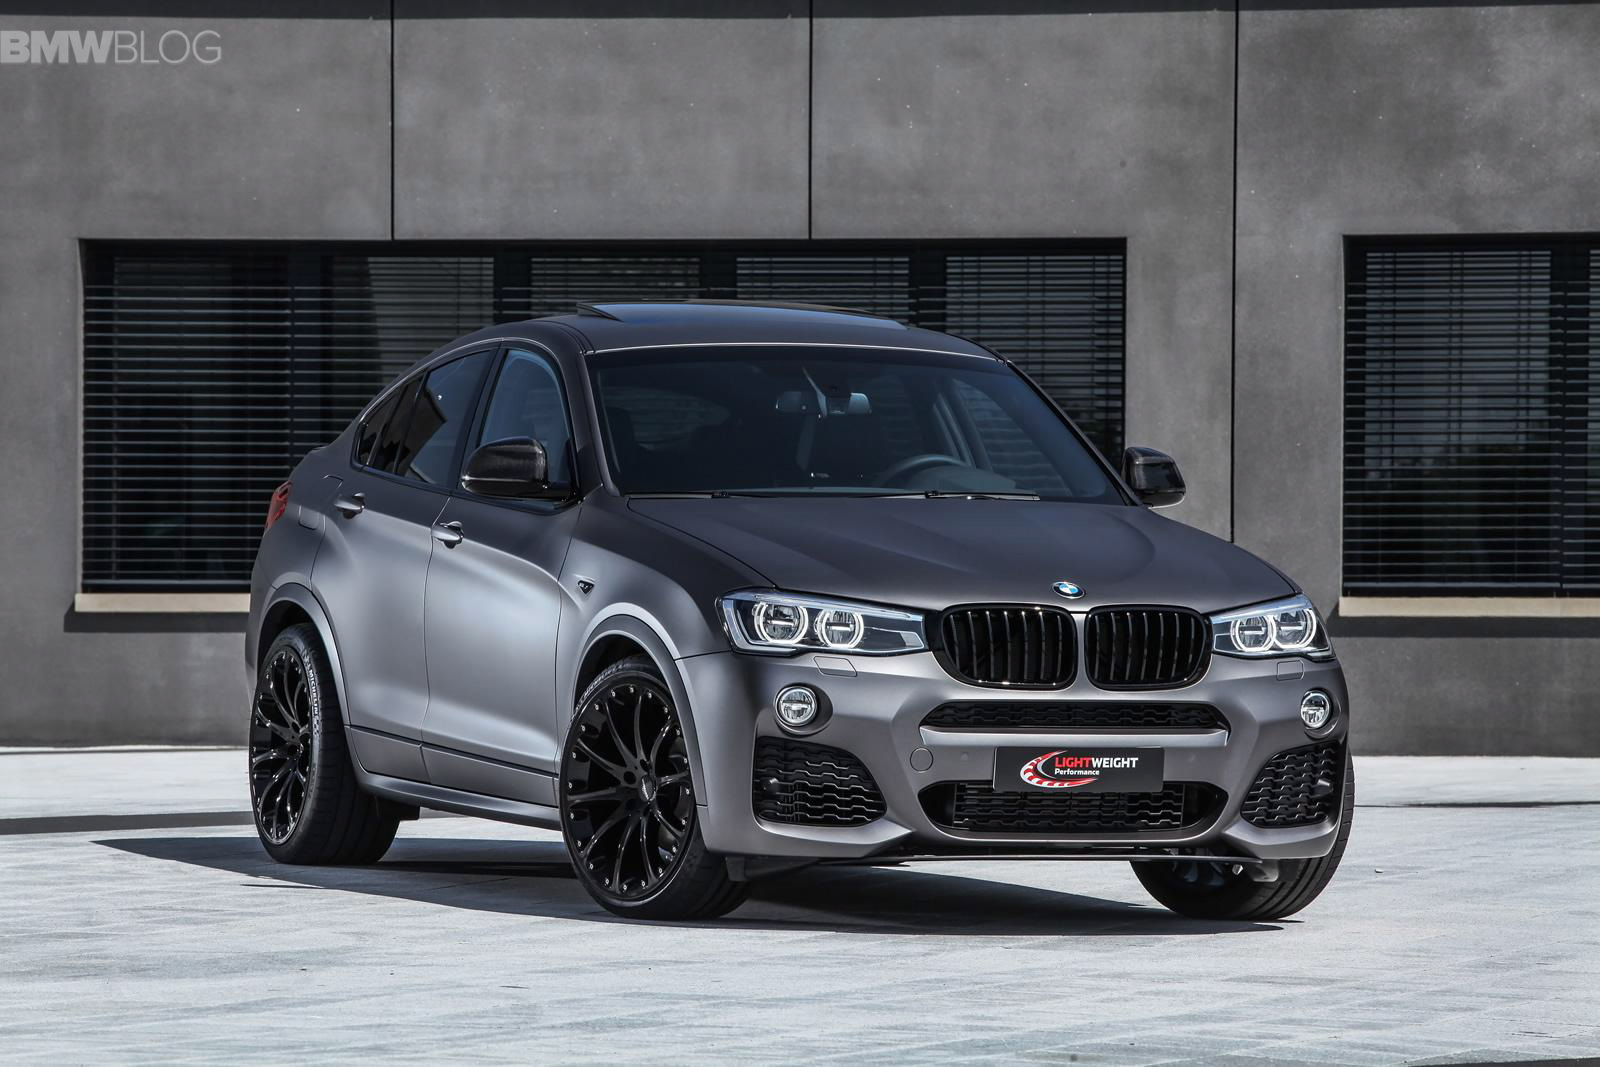 BMW X4 Lightweight images 10